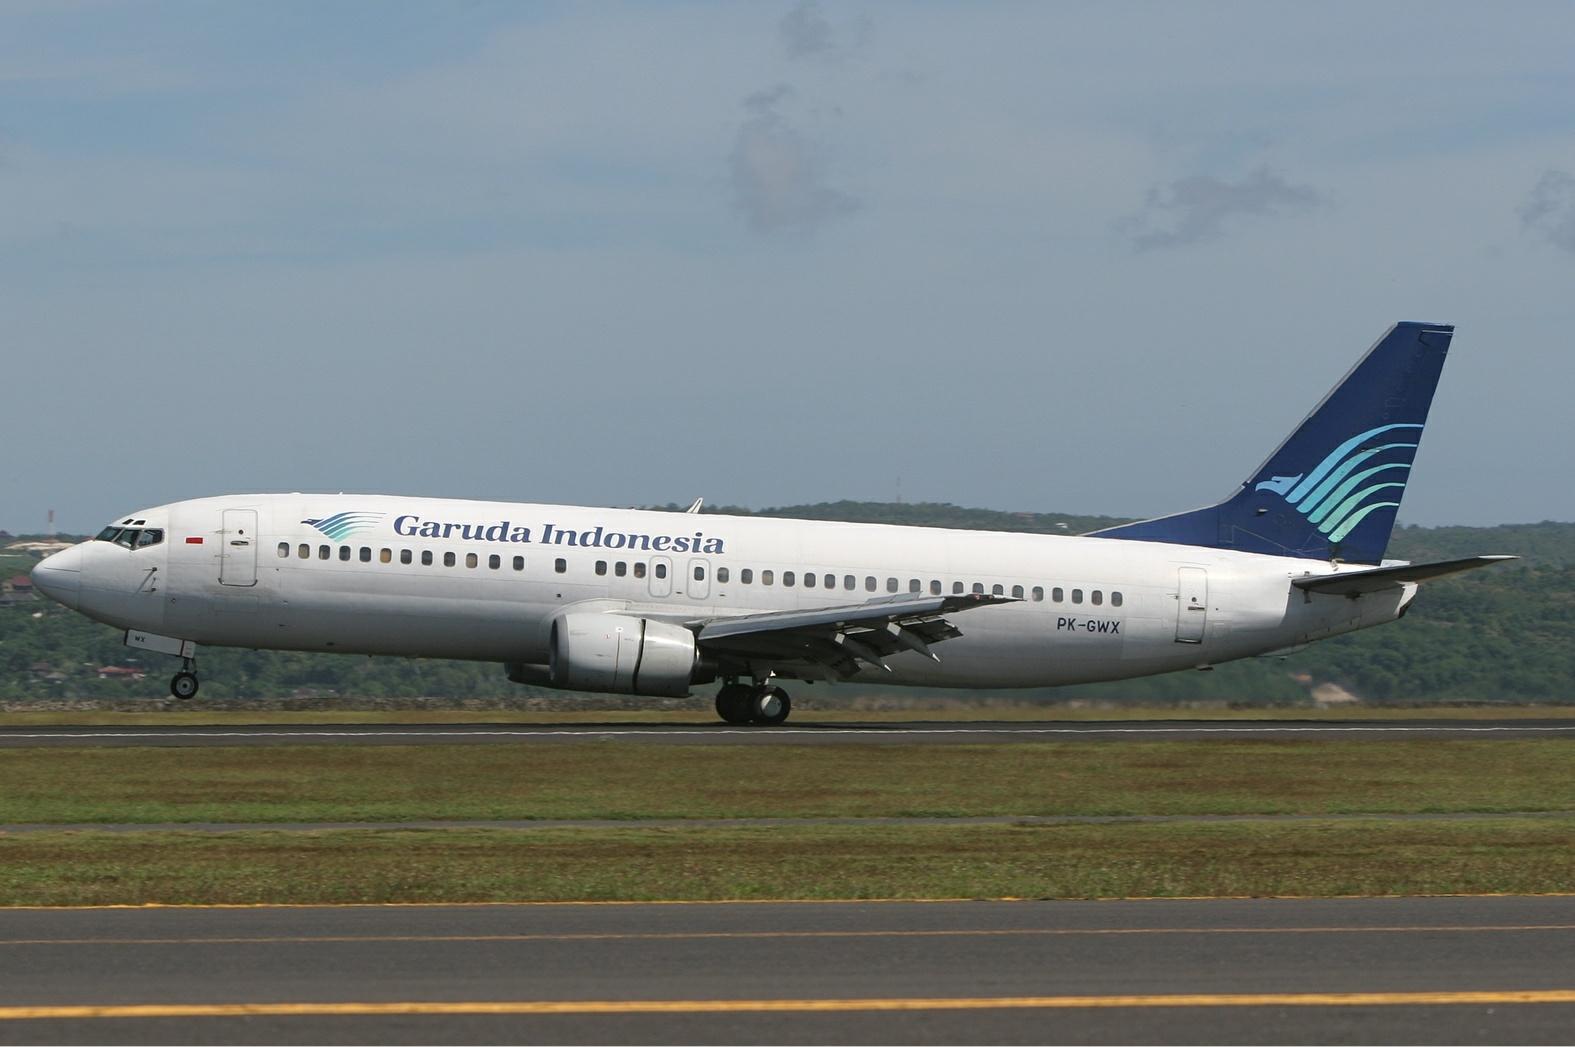 Garuda_Indonesia_Boeing_737-400_Stegmeier